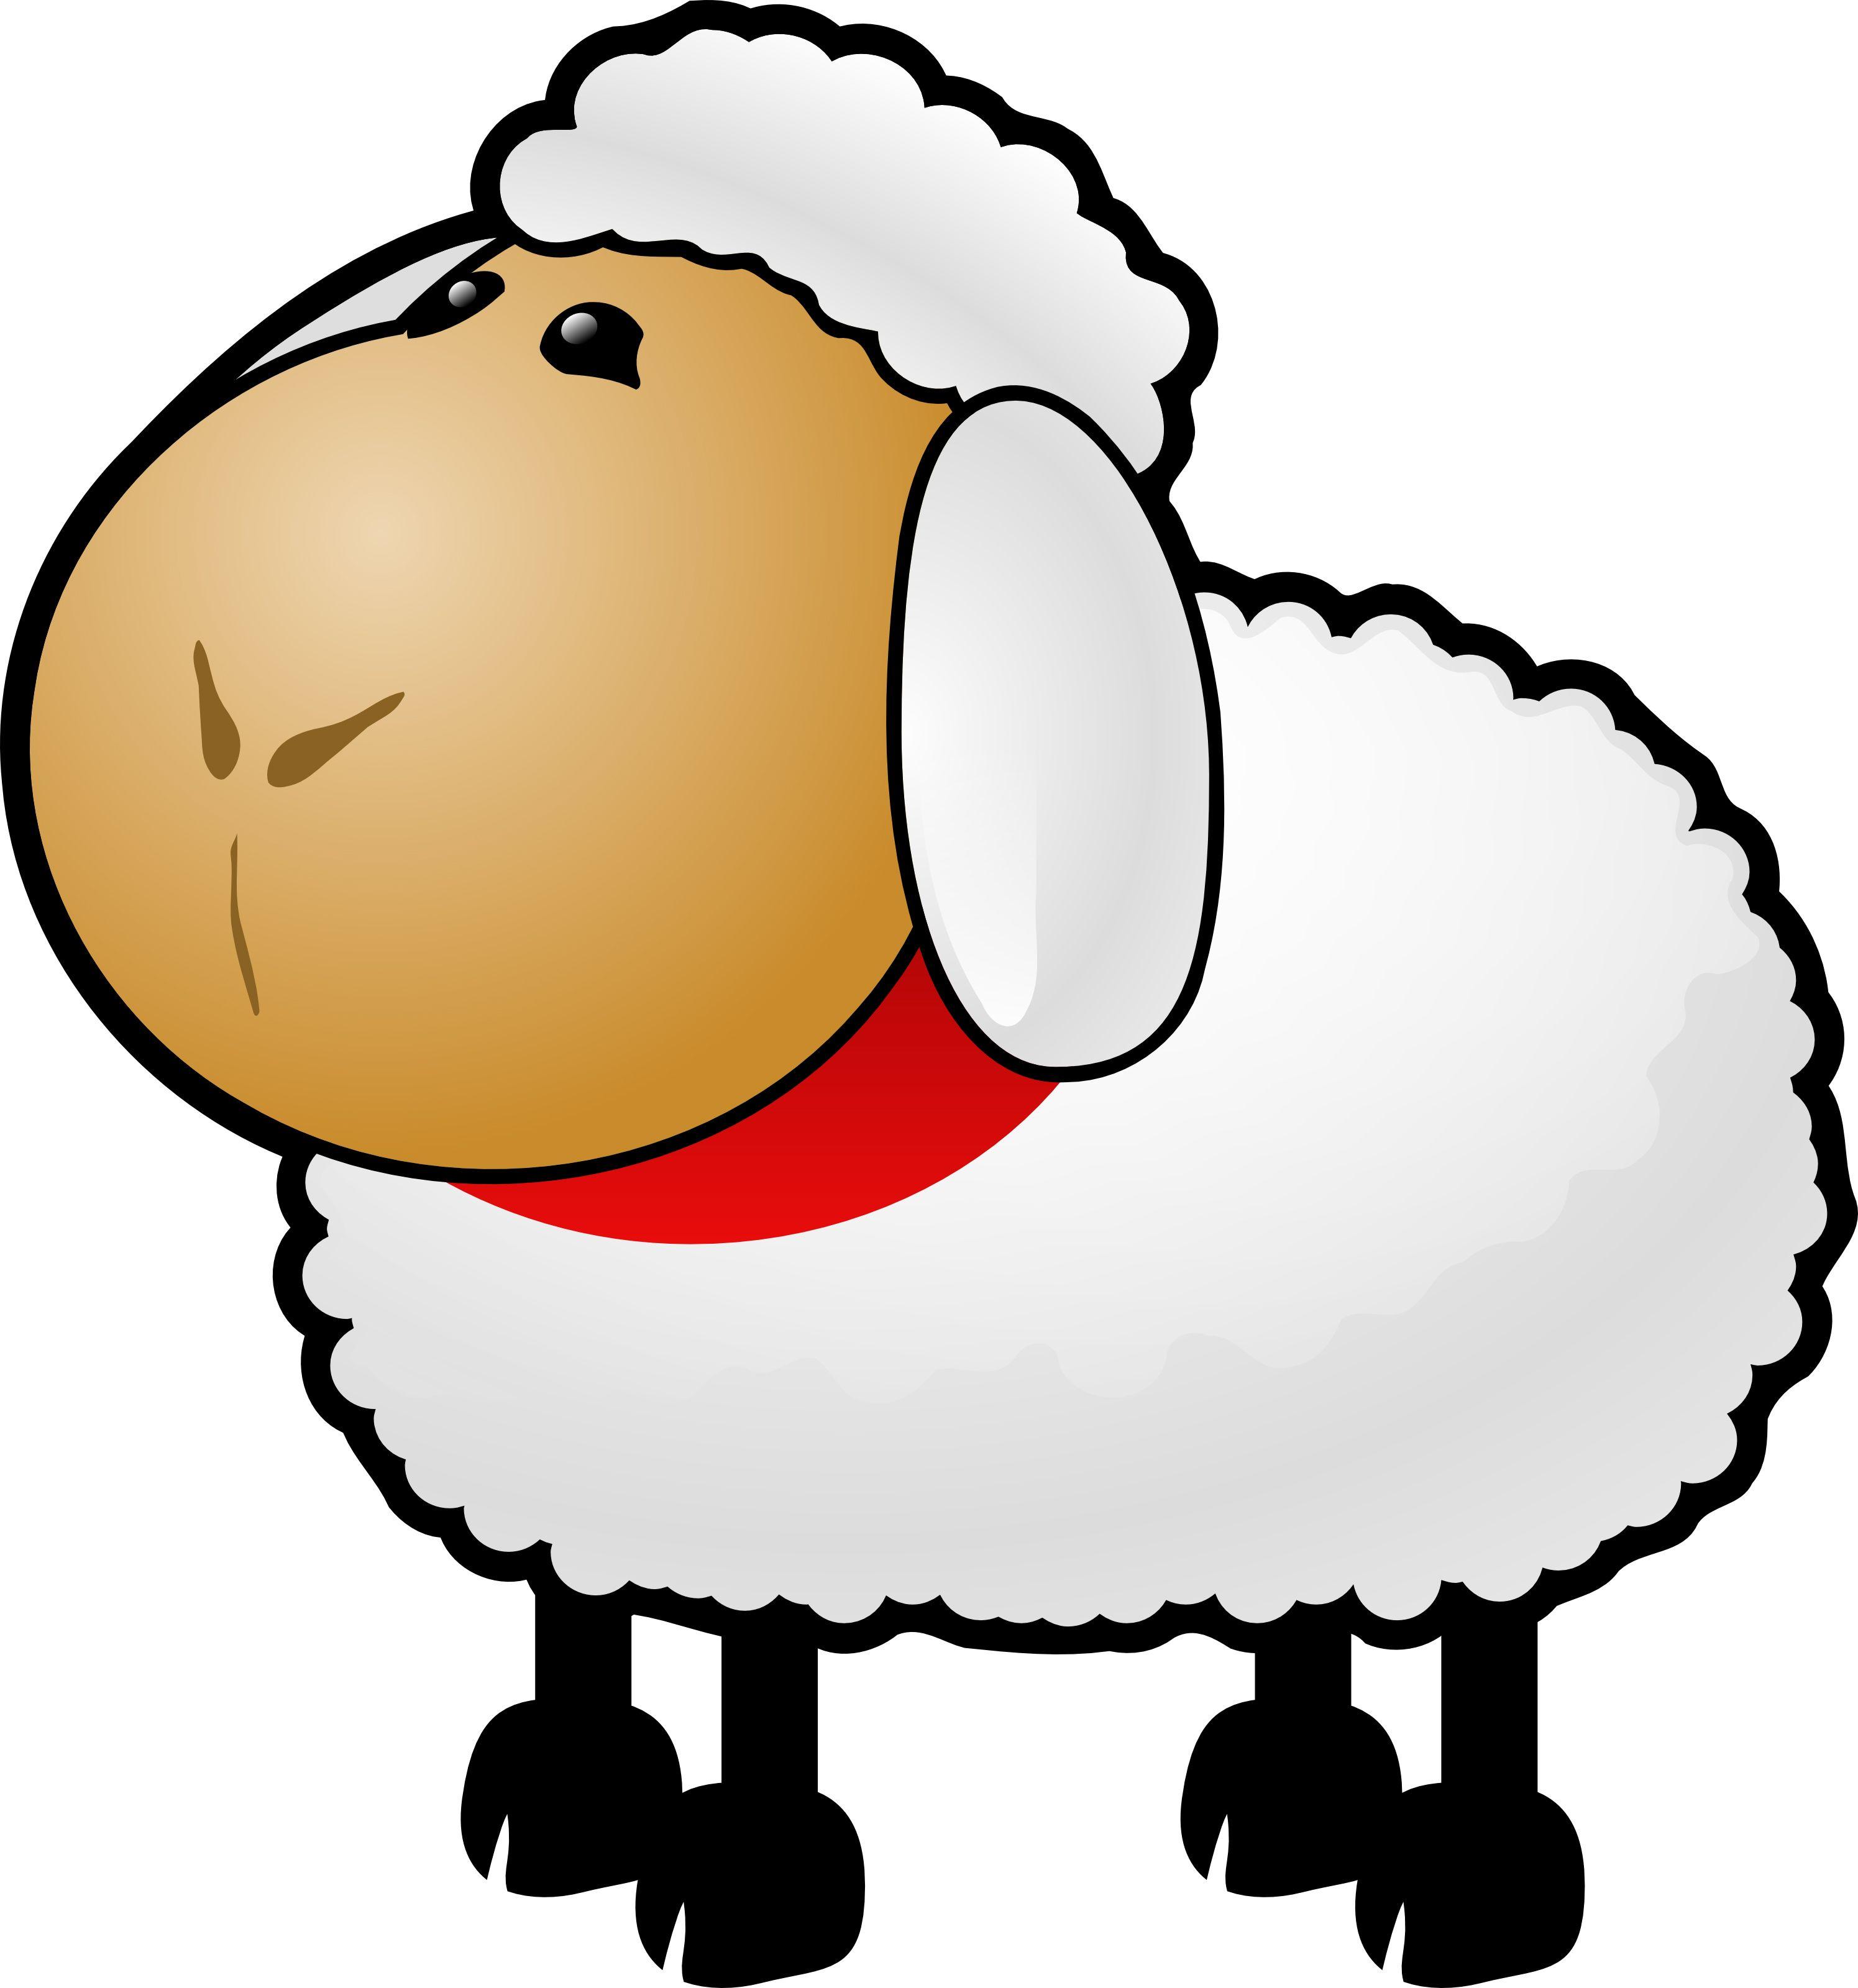 2990x3200 Free Cartoon Sheep Clipart 2015 Sheep Goat